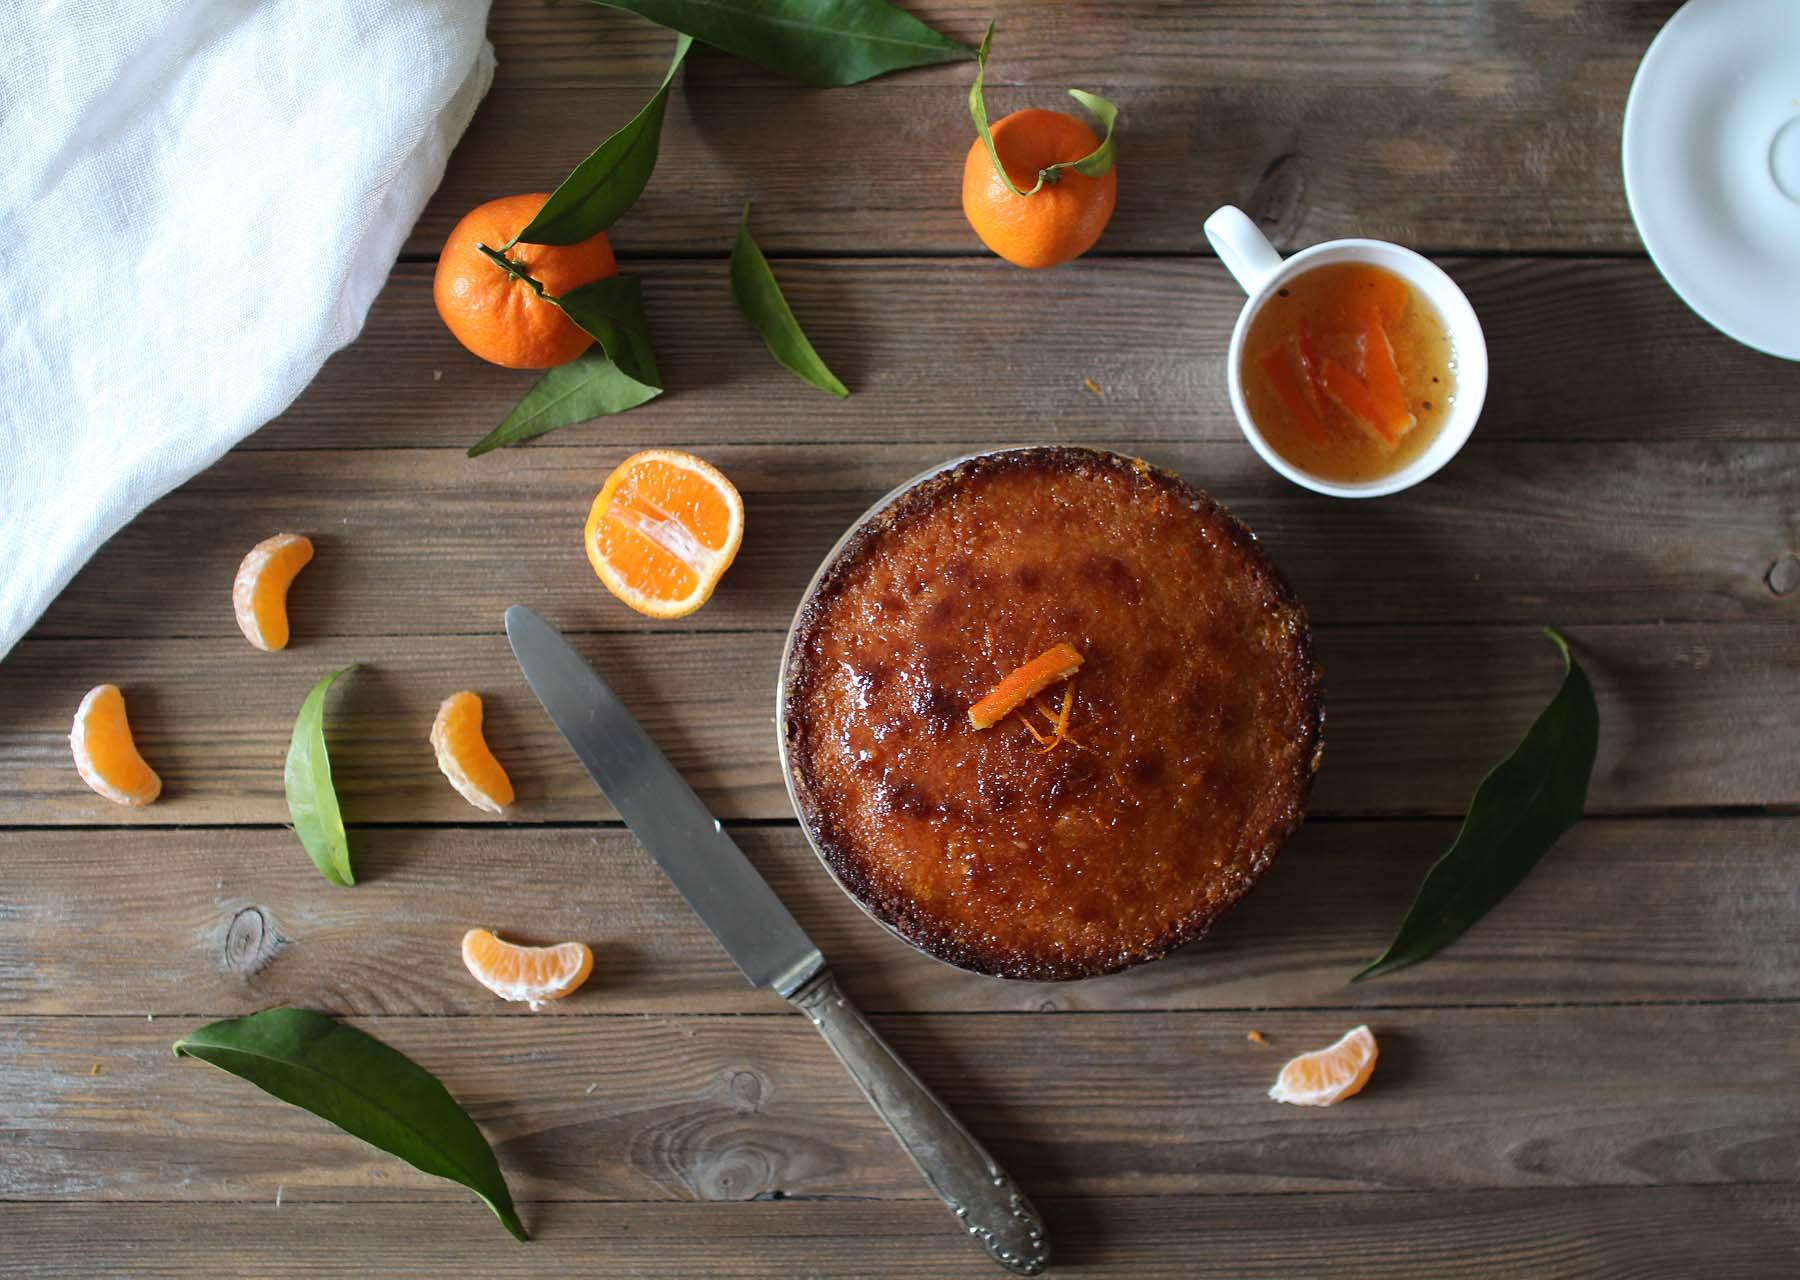 gateau-clementines-jerusalem